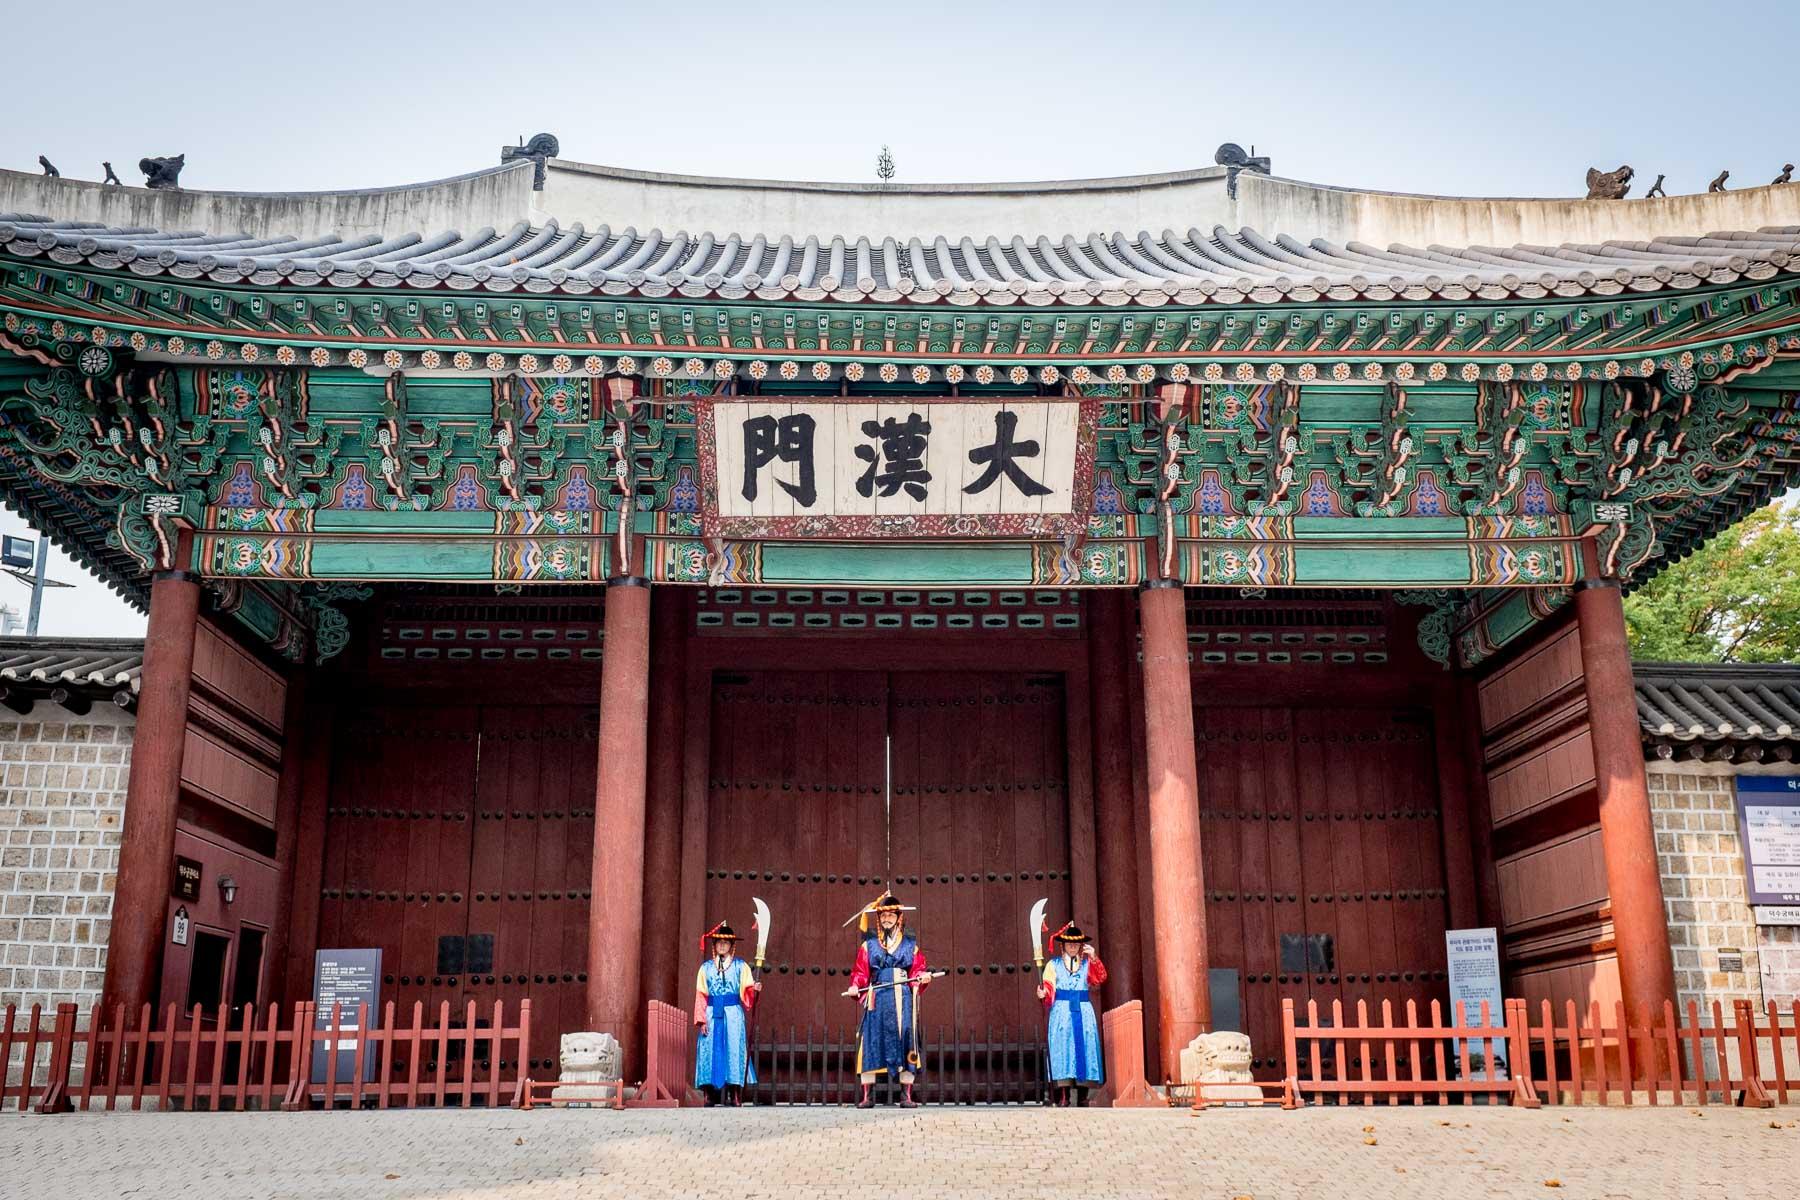 Seoul Fall 2015 (13 of 32)